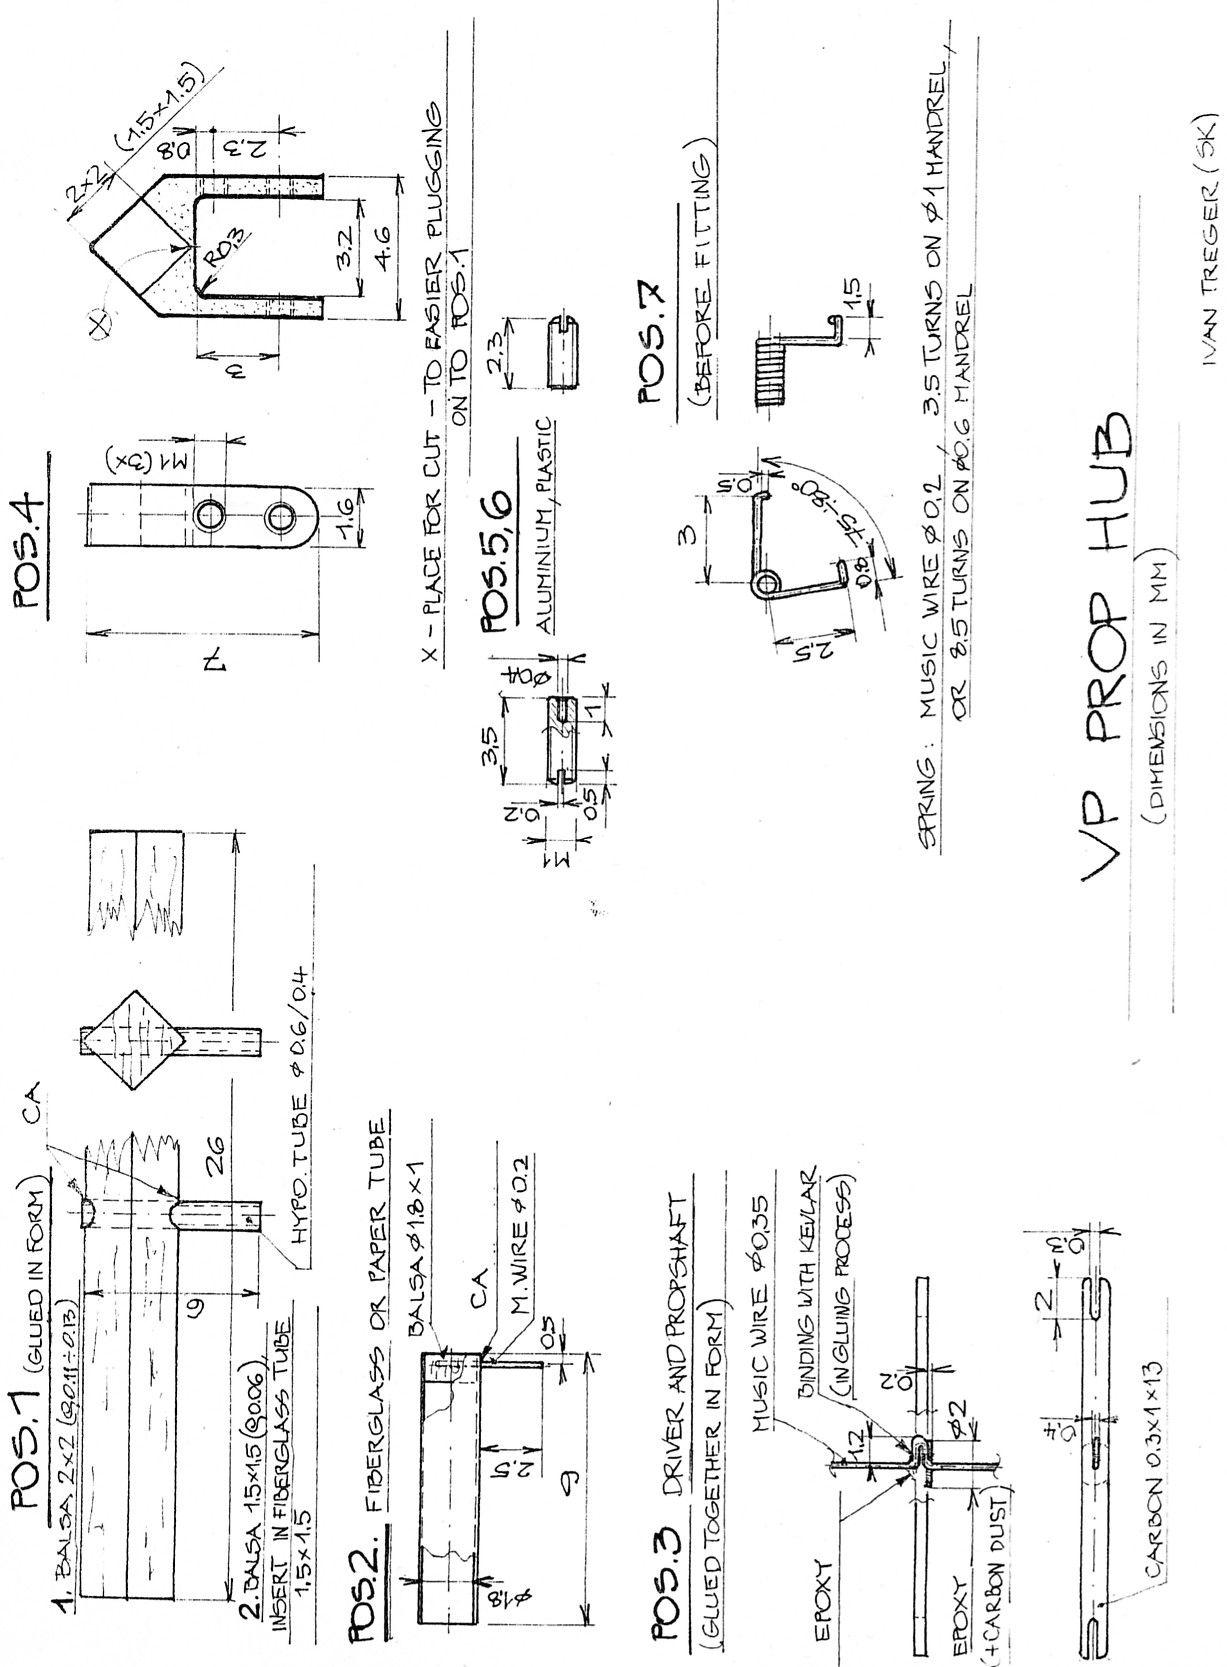 Plan Of Ivan Treger S 0 6 Gram Rubber F1d Variable Pitch